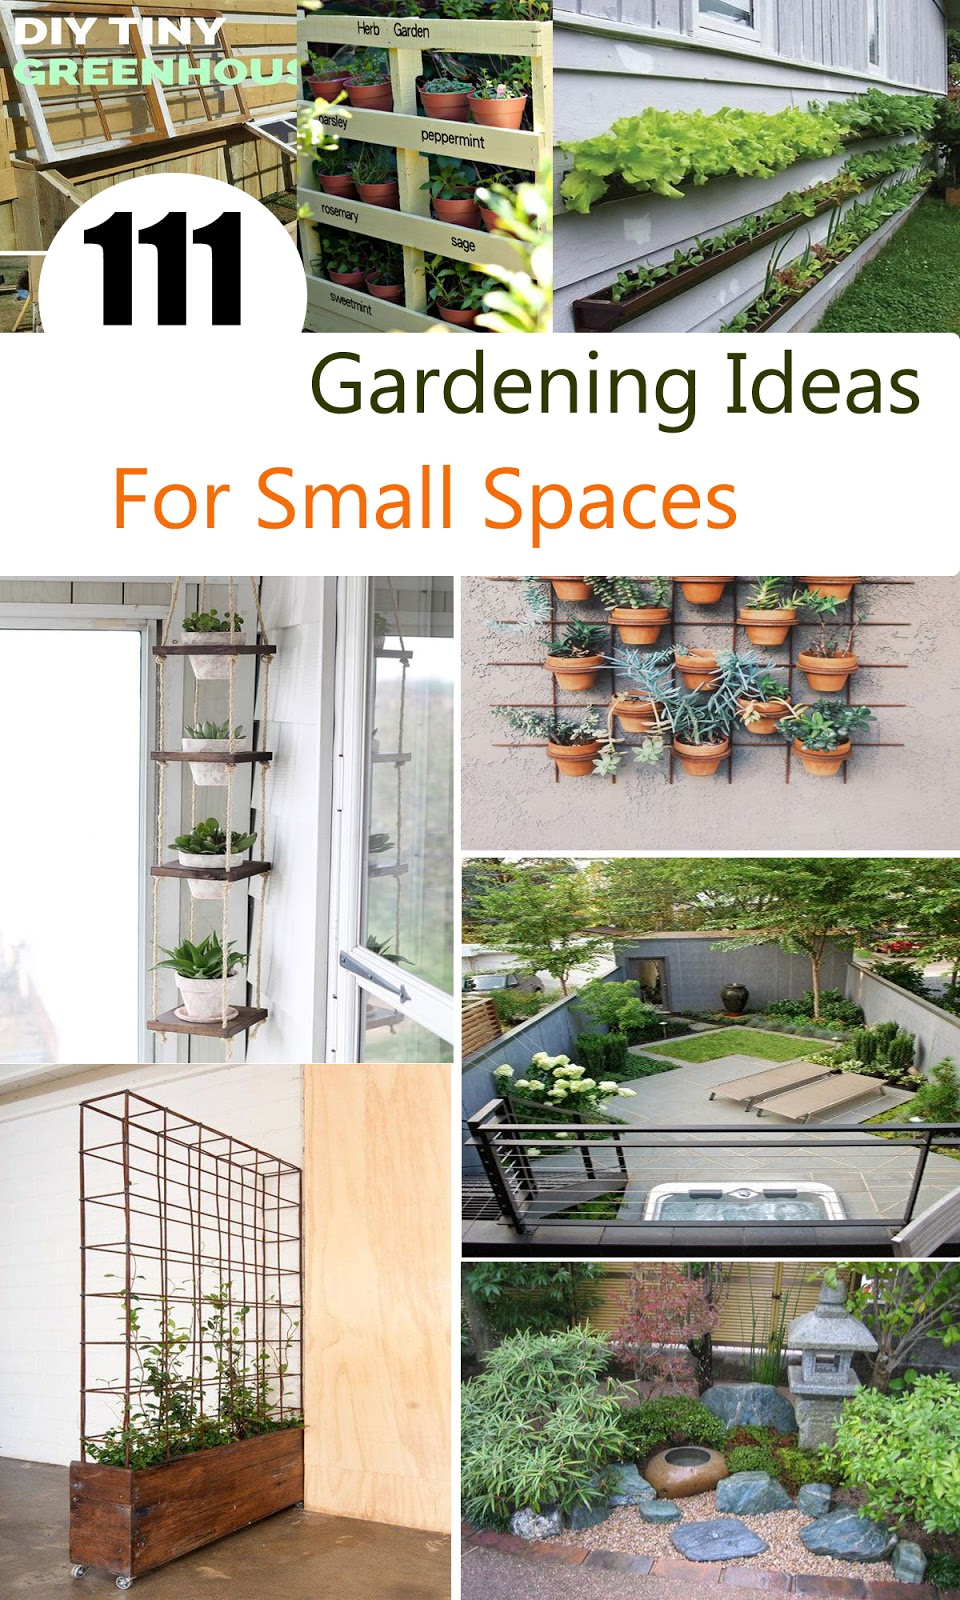 111 Gardening Ideas For Small Spaces A Blog On Garden